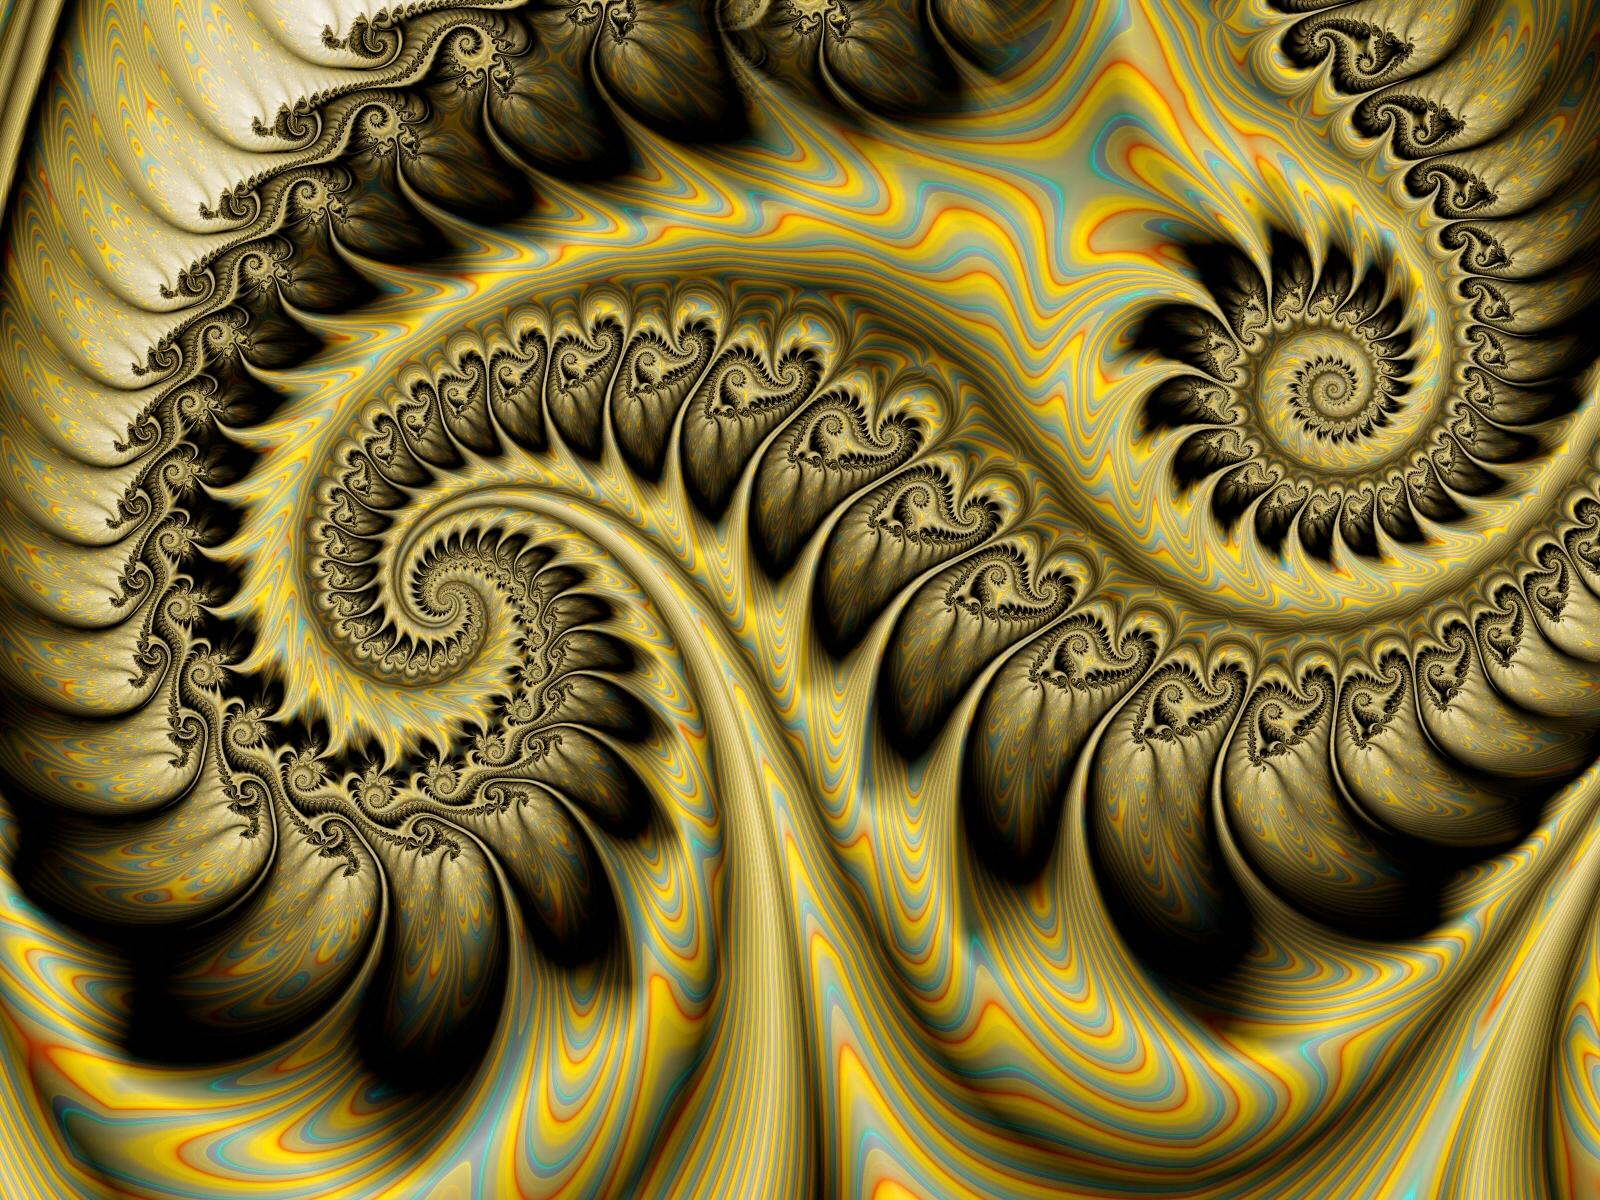 Melting Swirls by Thelma1